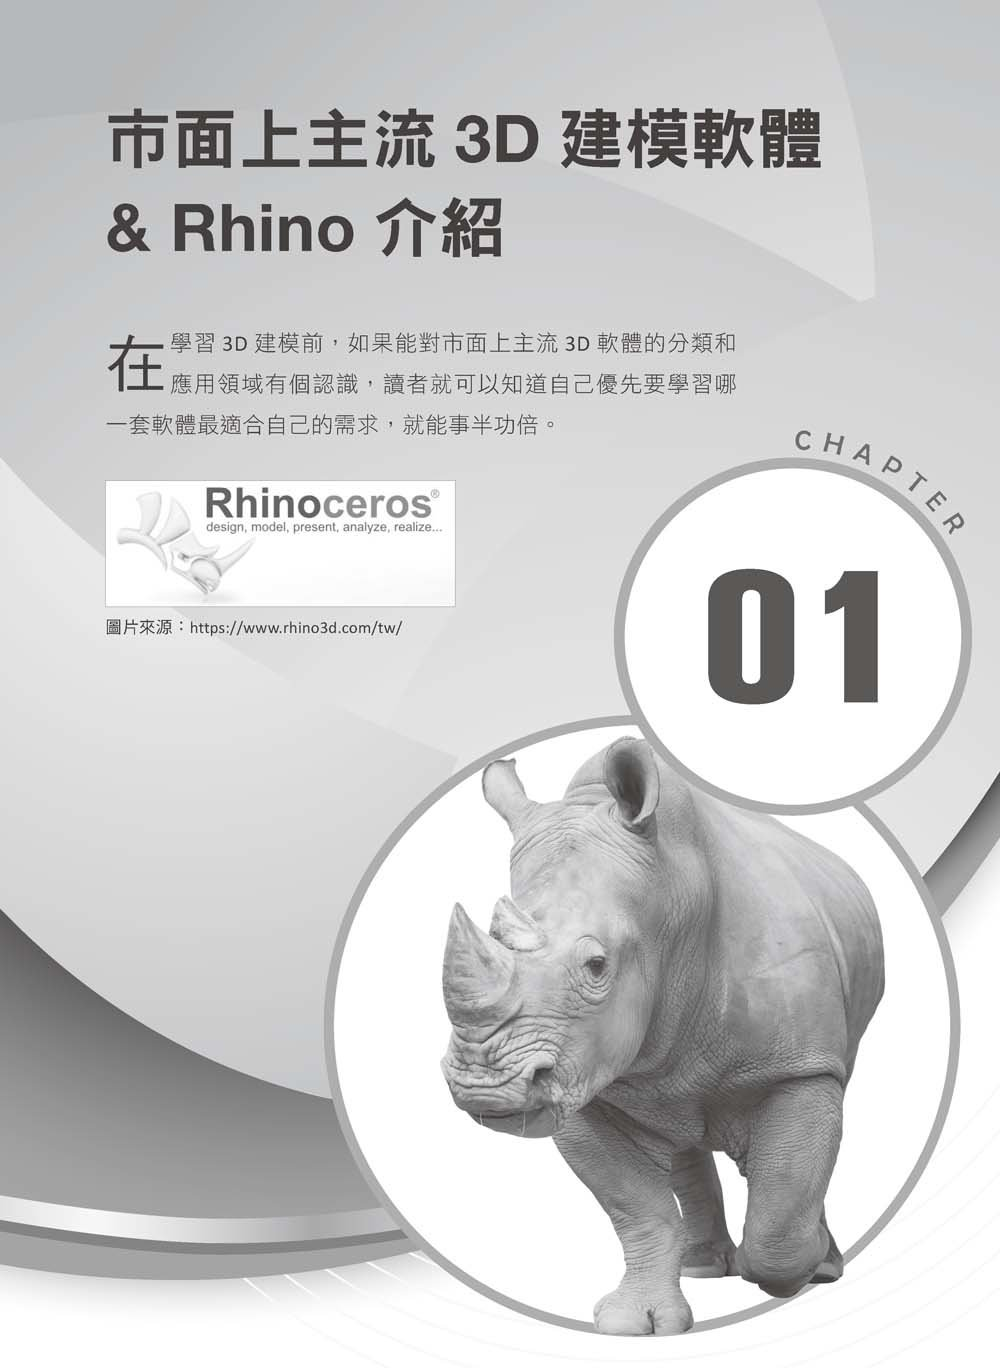 Rhinoceros 6 全攻略:自學設計與 3D建模寶典-preview-15